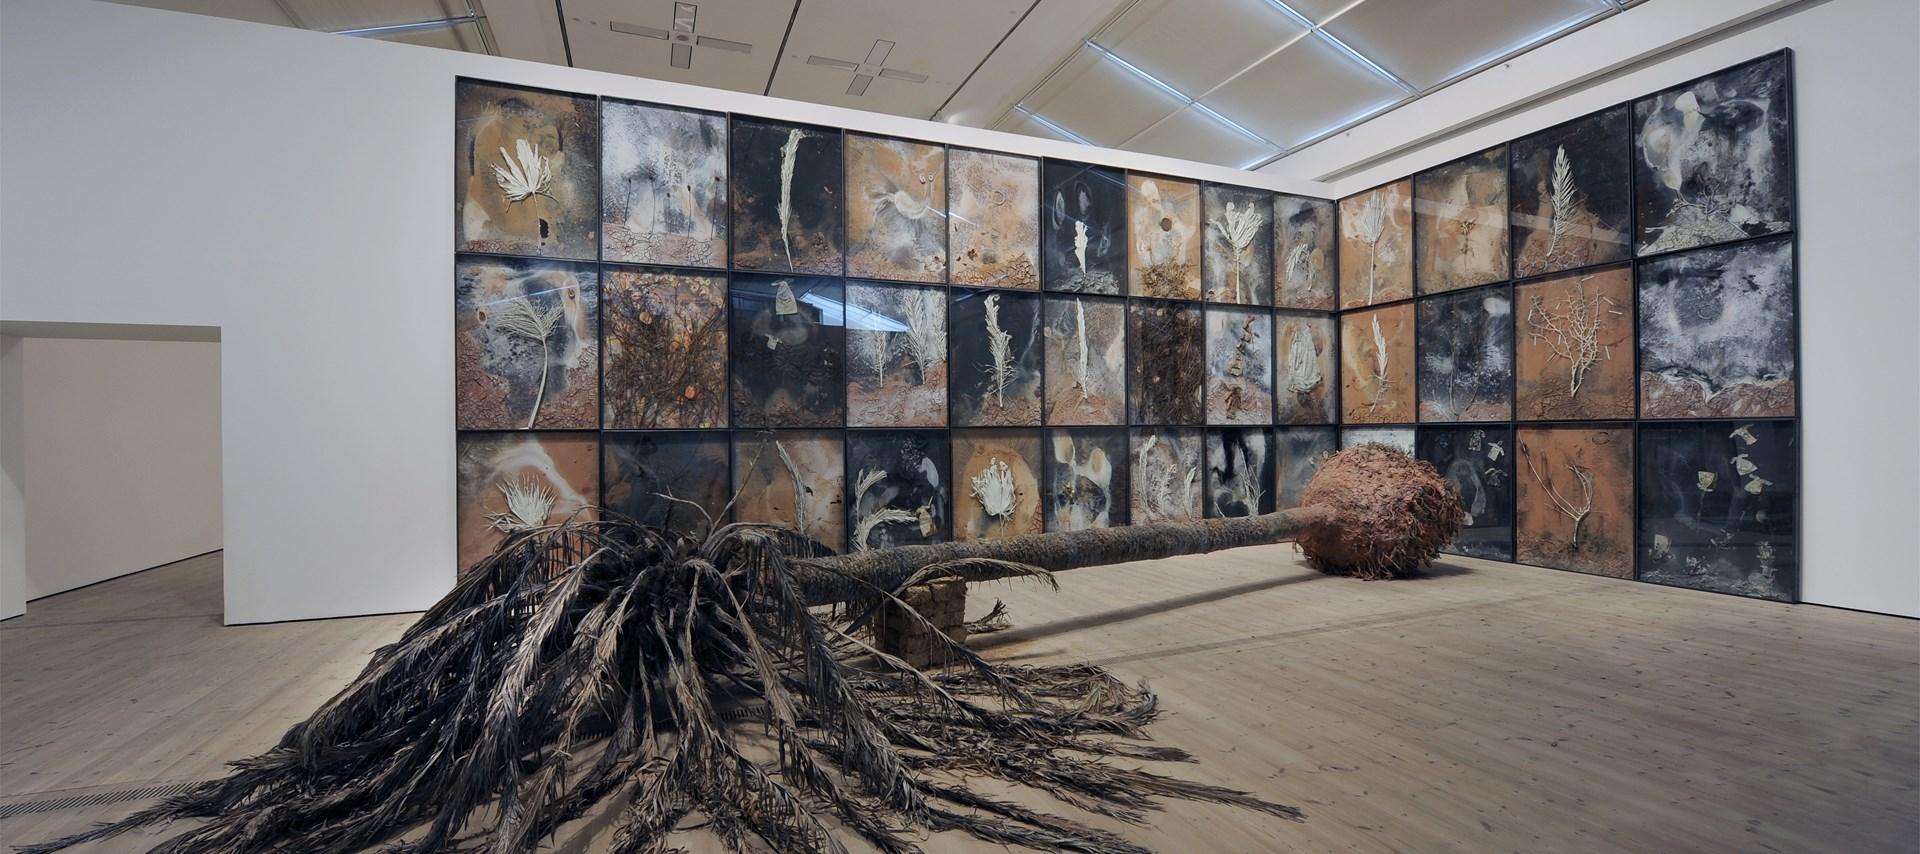 Anselm Kiefer: Artist Rooms: Palm Sunday, 2006. Image by Colin Davison